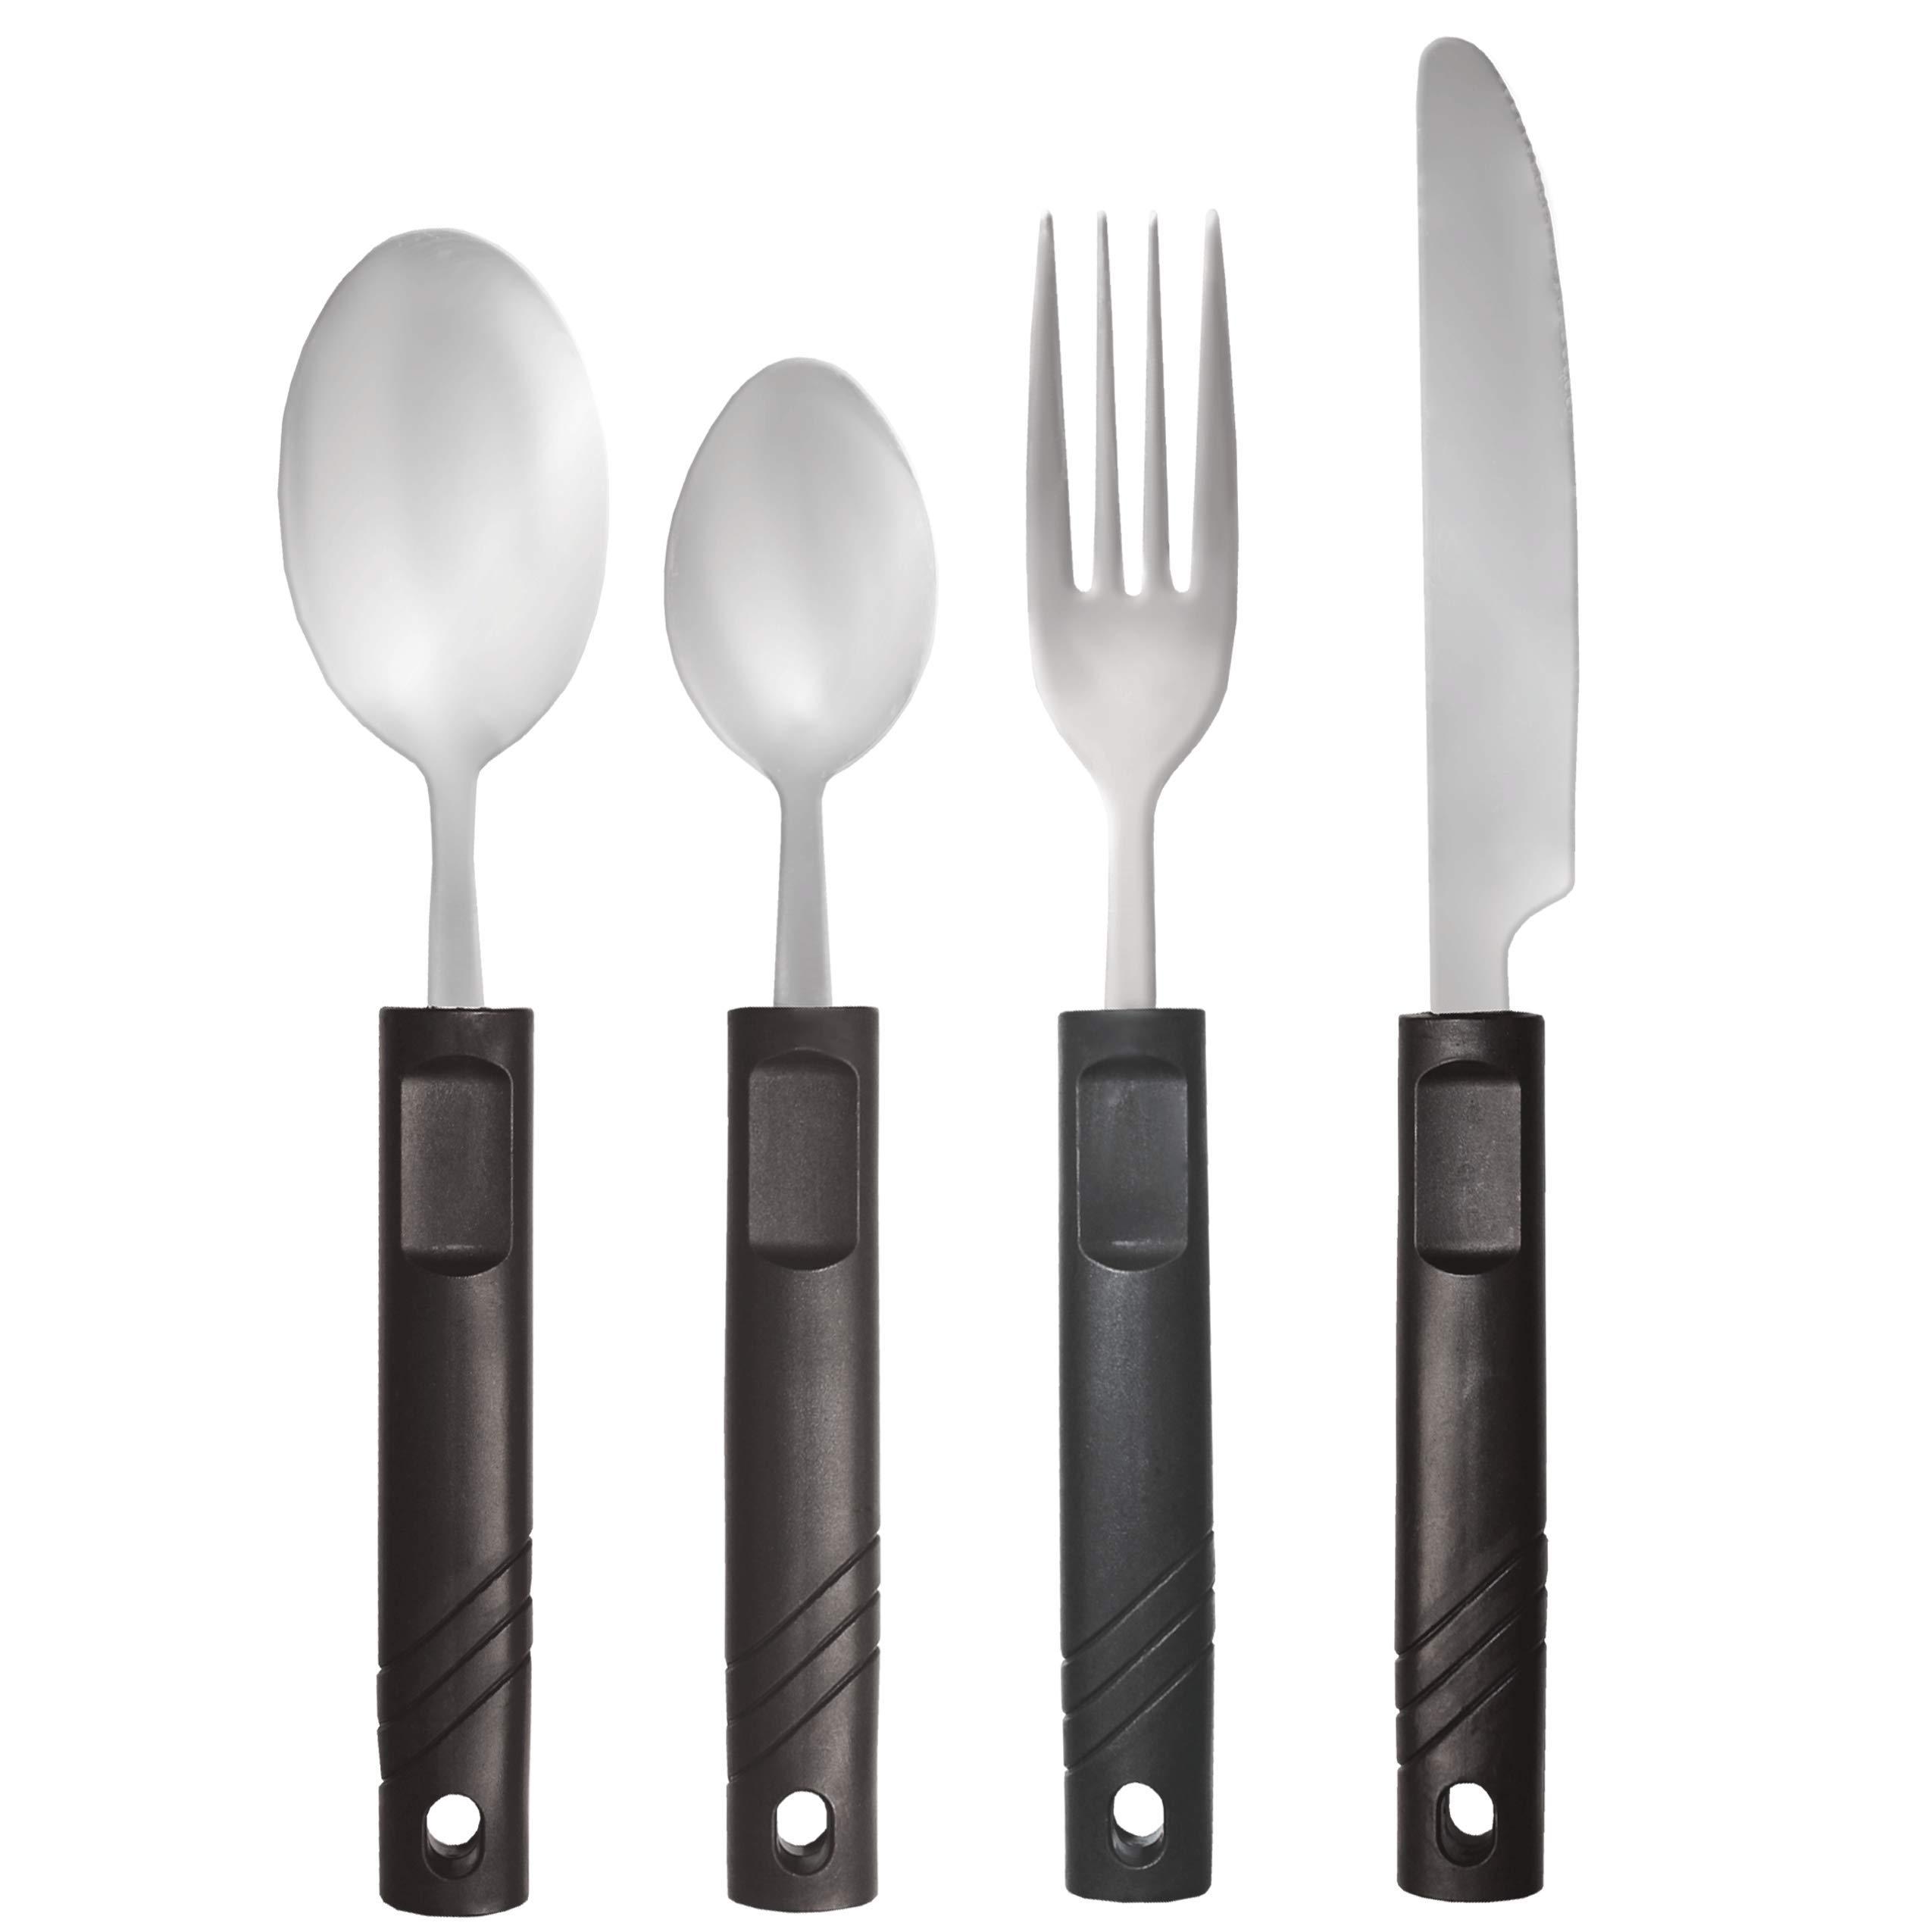 Rehabilitation Advantage Lightweight 4-piece Utensil Set - Fork, Knife, Tablespoon and Teaspoon